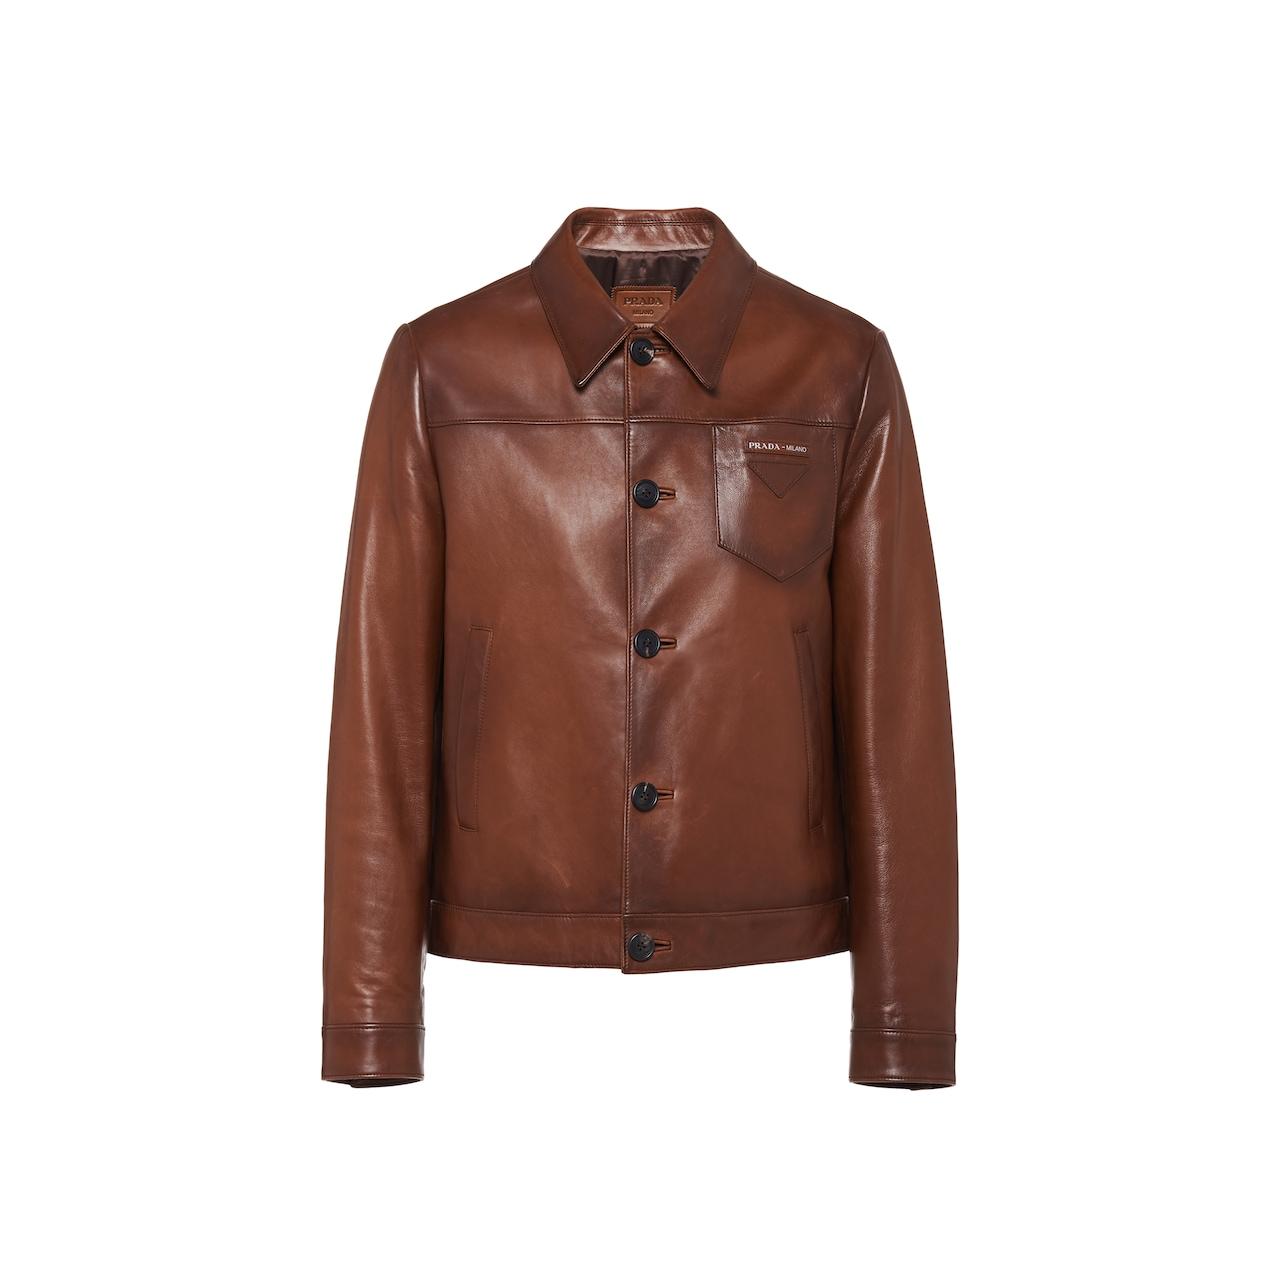 Jacke aus gewachstem Nappa-Leder